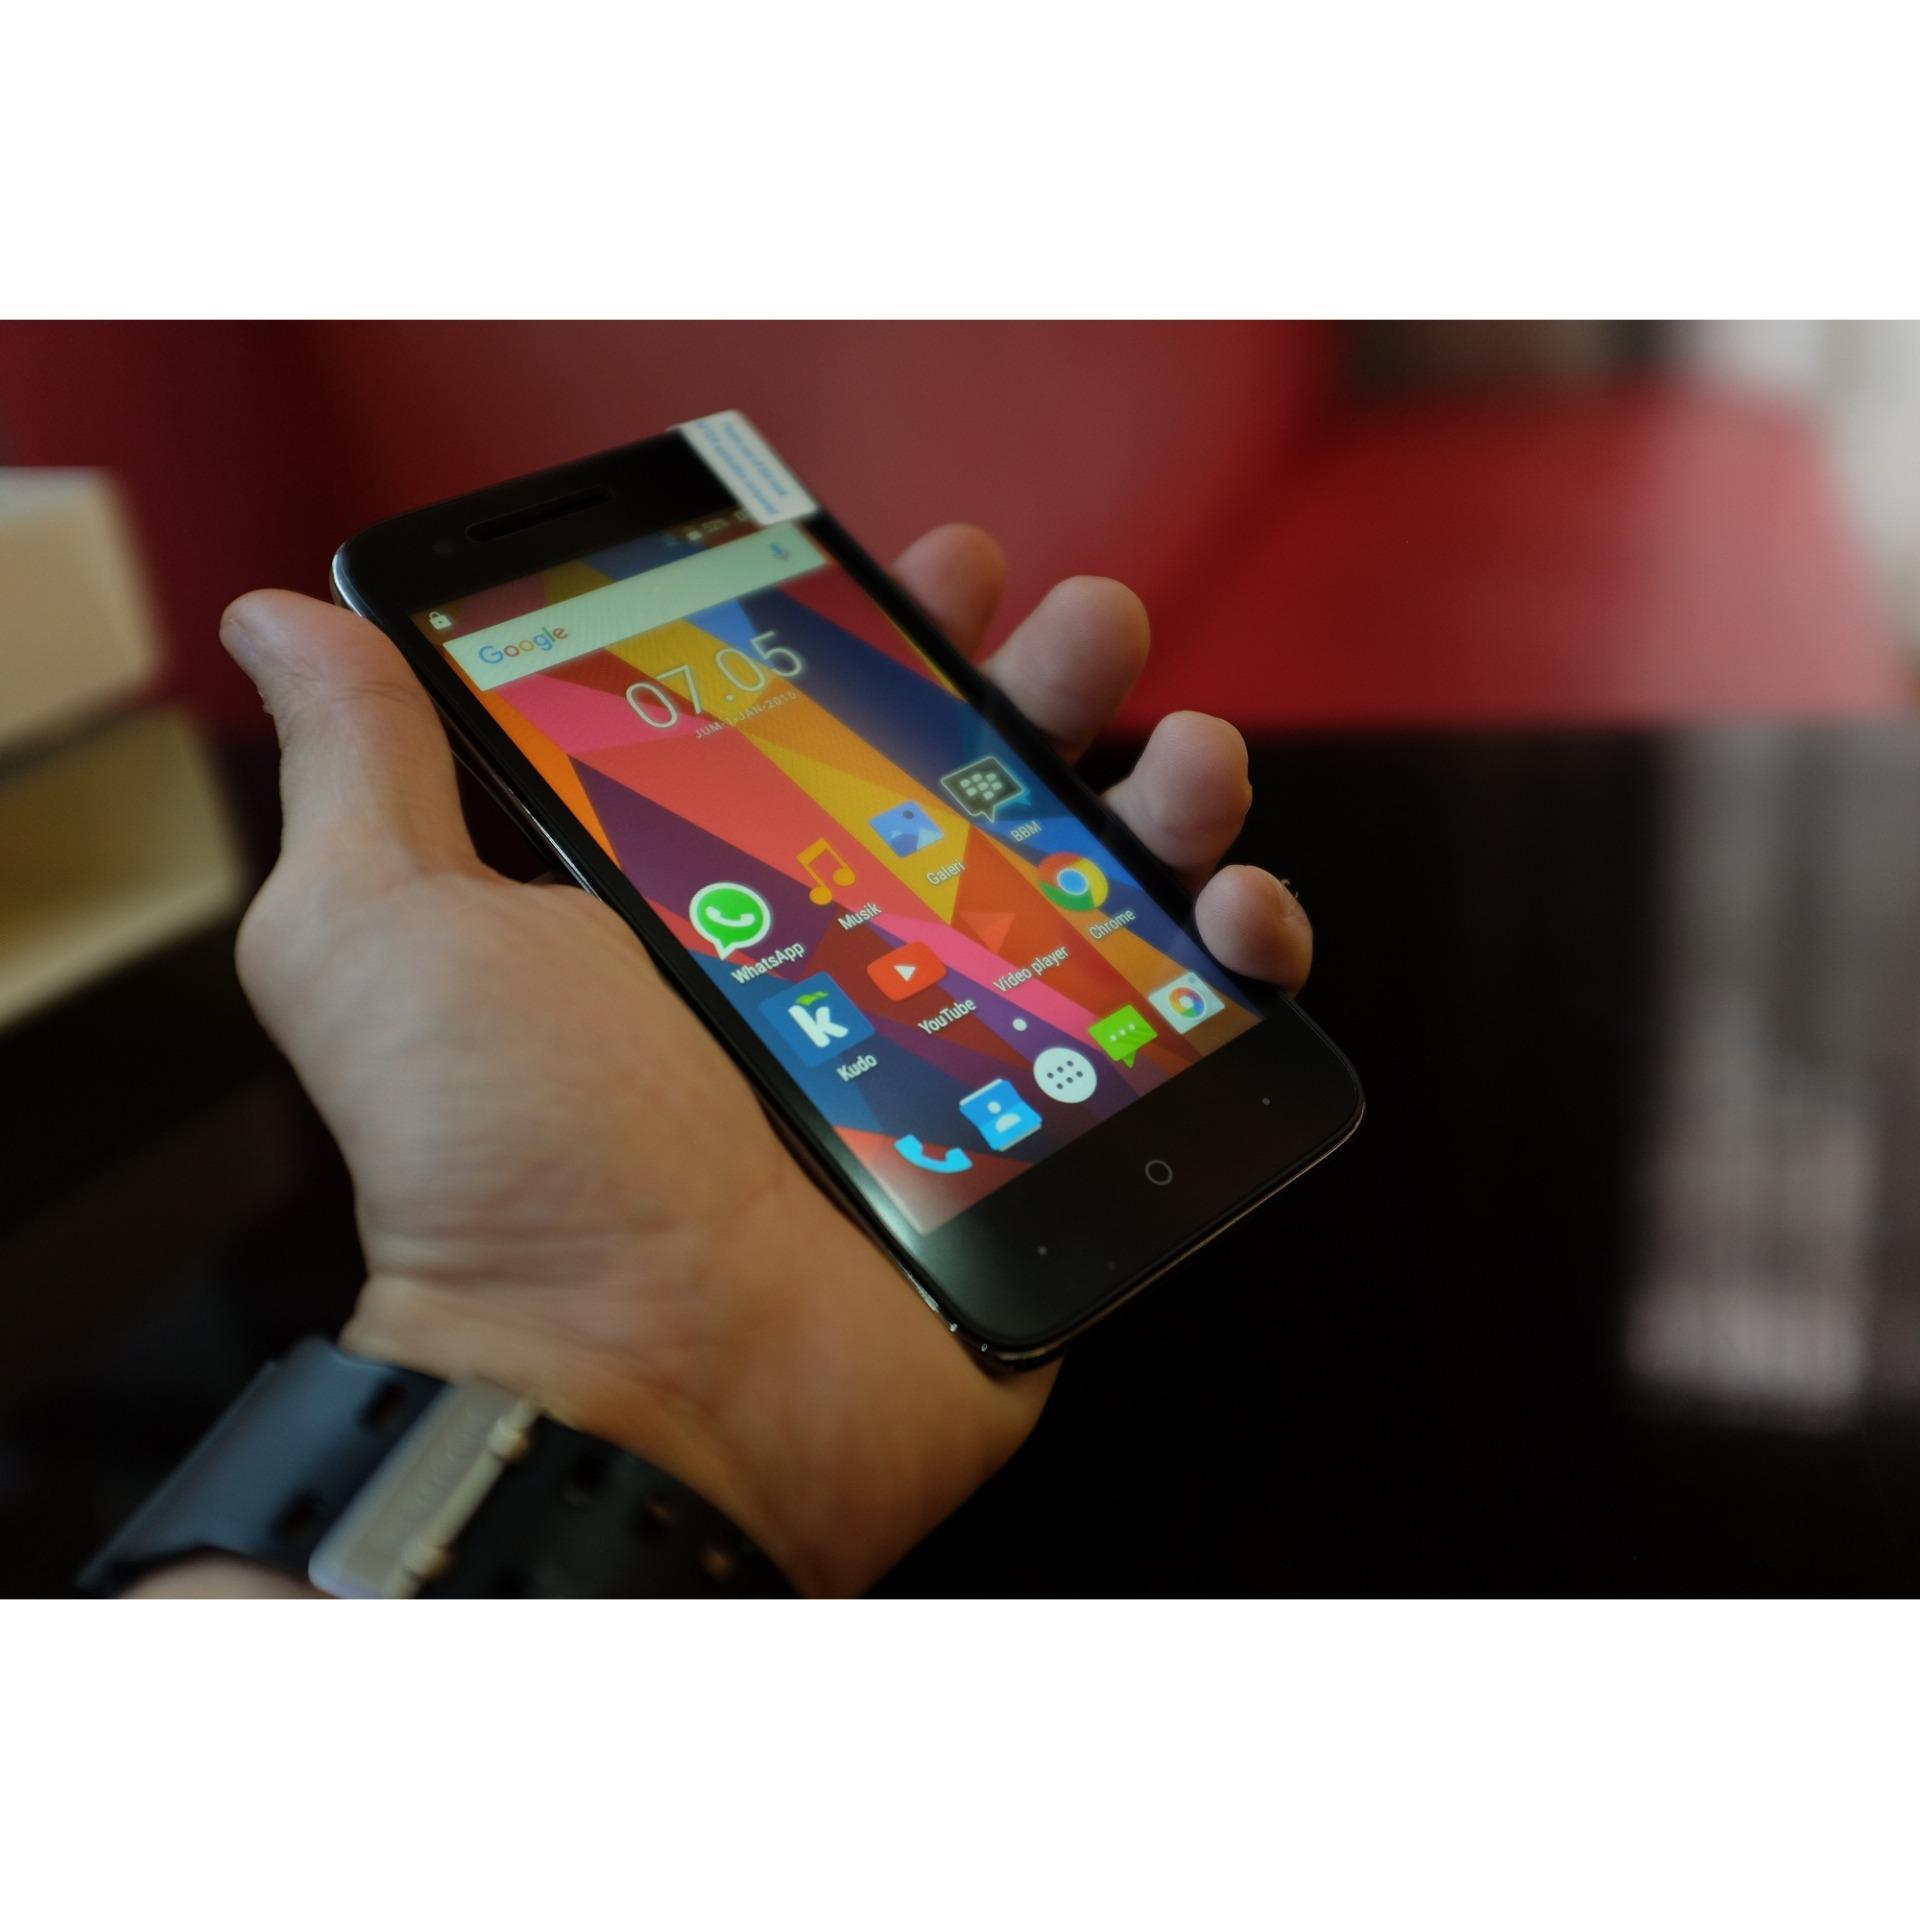 Bandingkan Simpan Hp Icherry C251 Android 6 0 Lcd Ips Hd 5 0 Inch